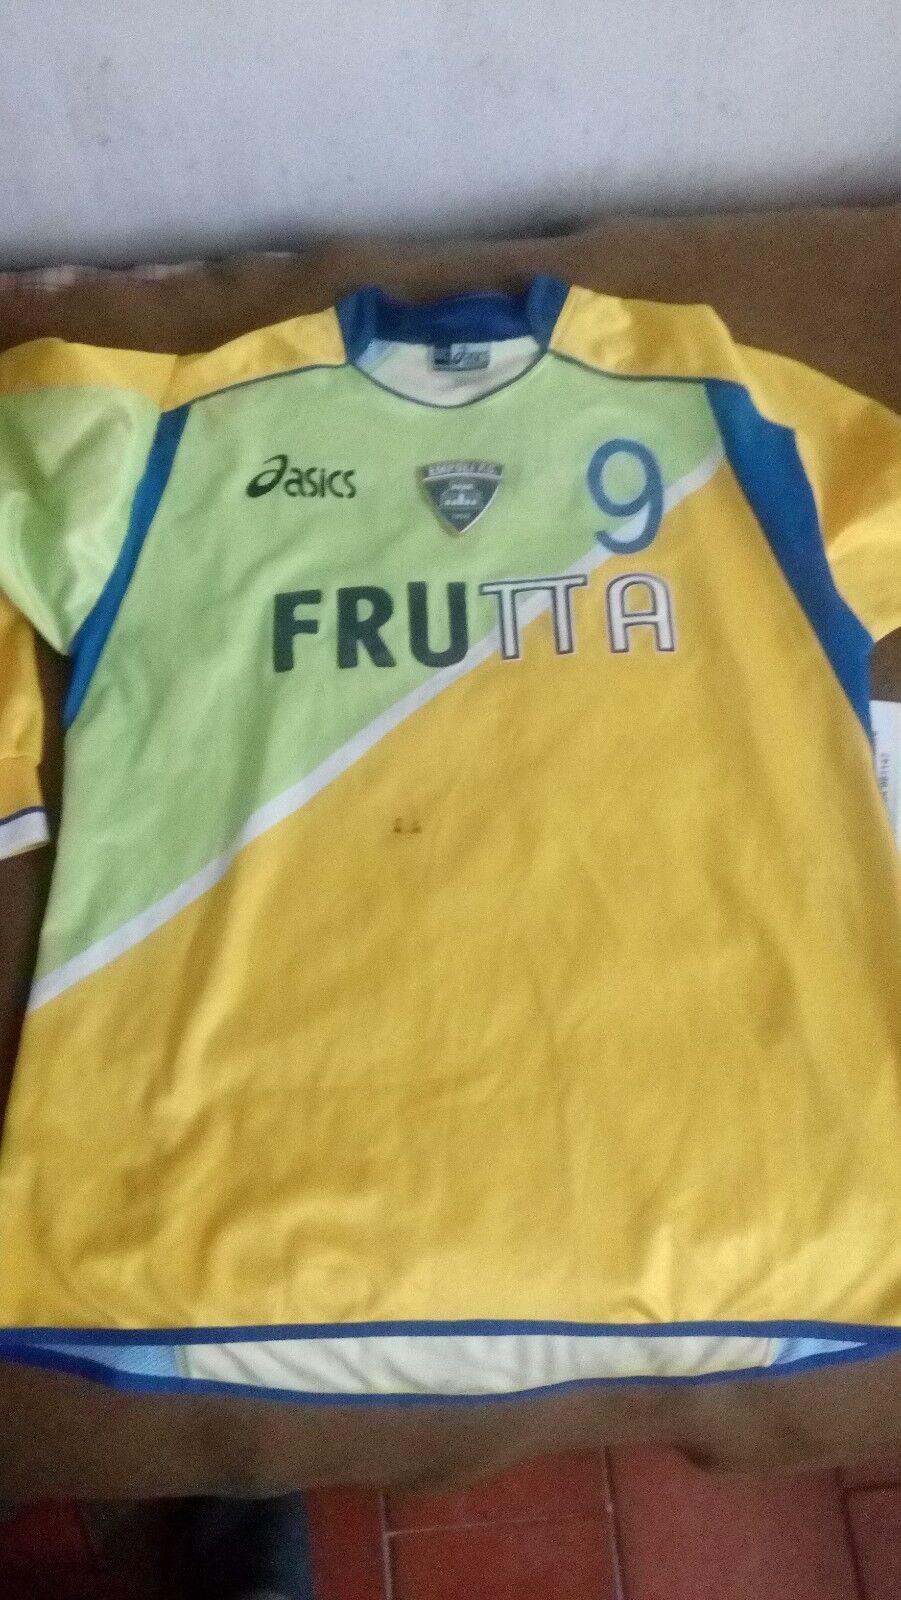 Maglia Empoli L chest 54-56 cm Raimonda shirt calcio football MATCH WORN